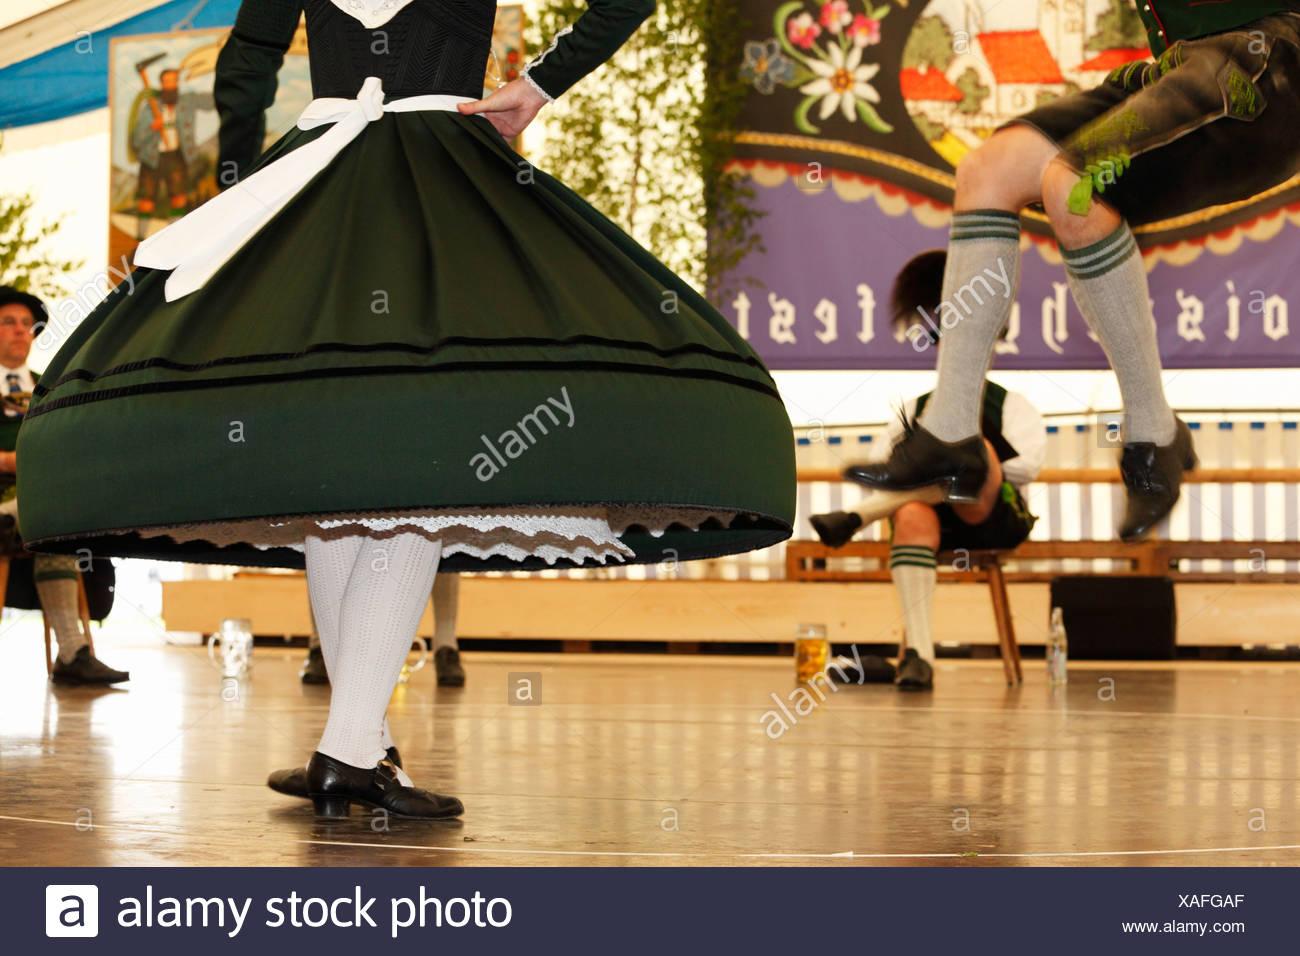 Schuhplattler, traditional folk dancers, 83rd Loisachgaufest in Neufahrn near Egling, Upper Bavaria, Bavaria, Germany, Europe Stock Photo